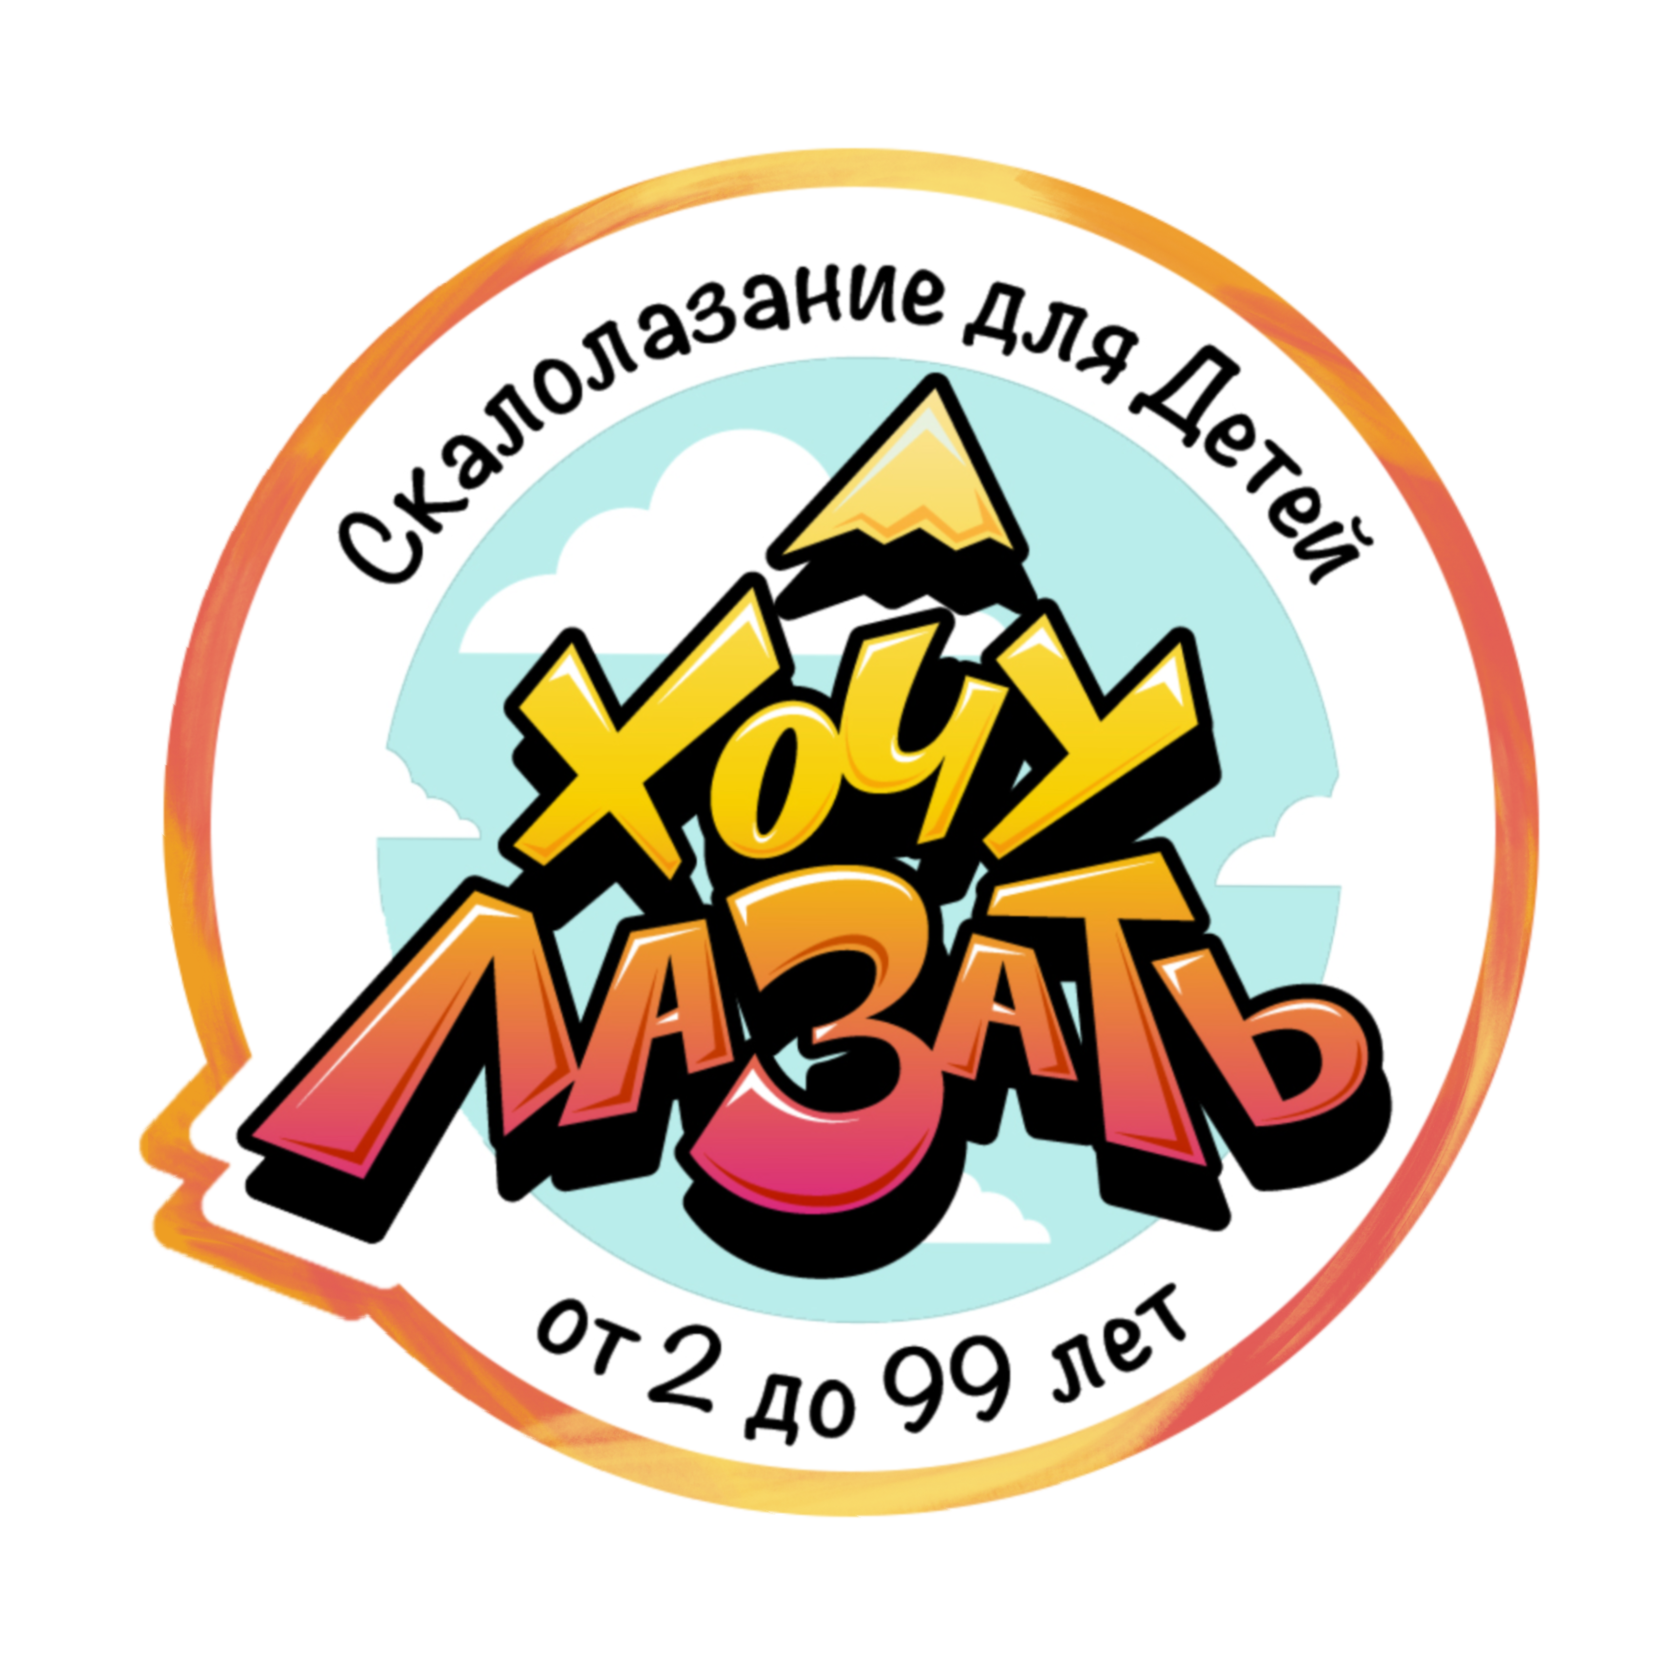 Скалодром ХочуЛазать